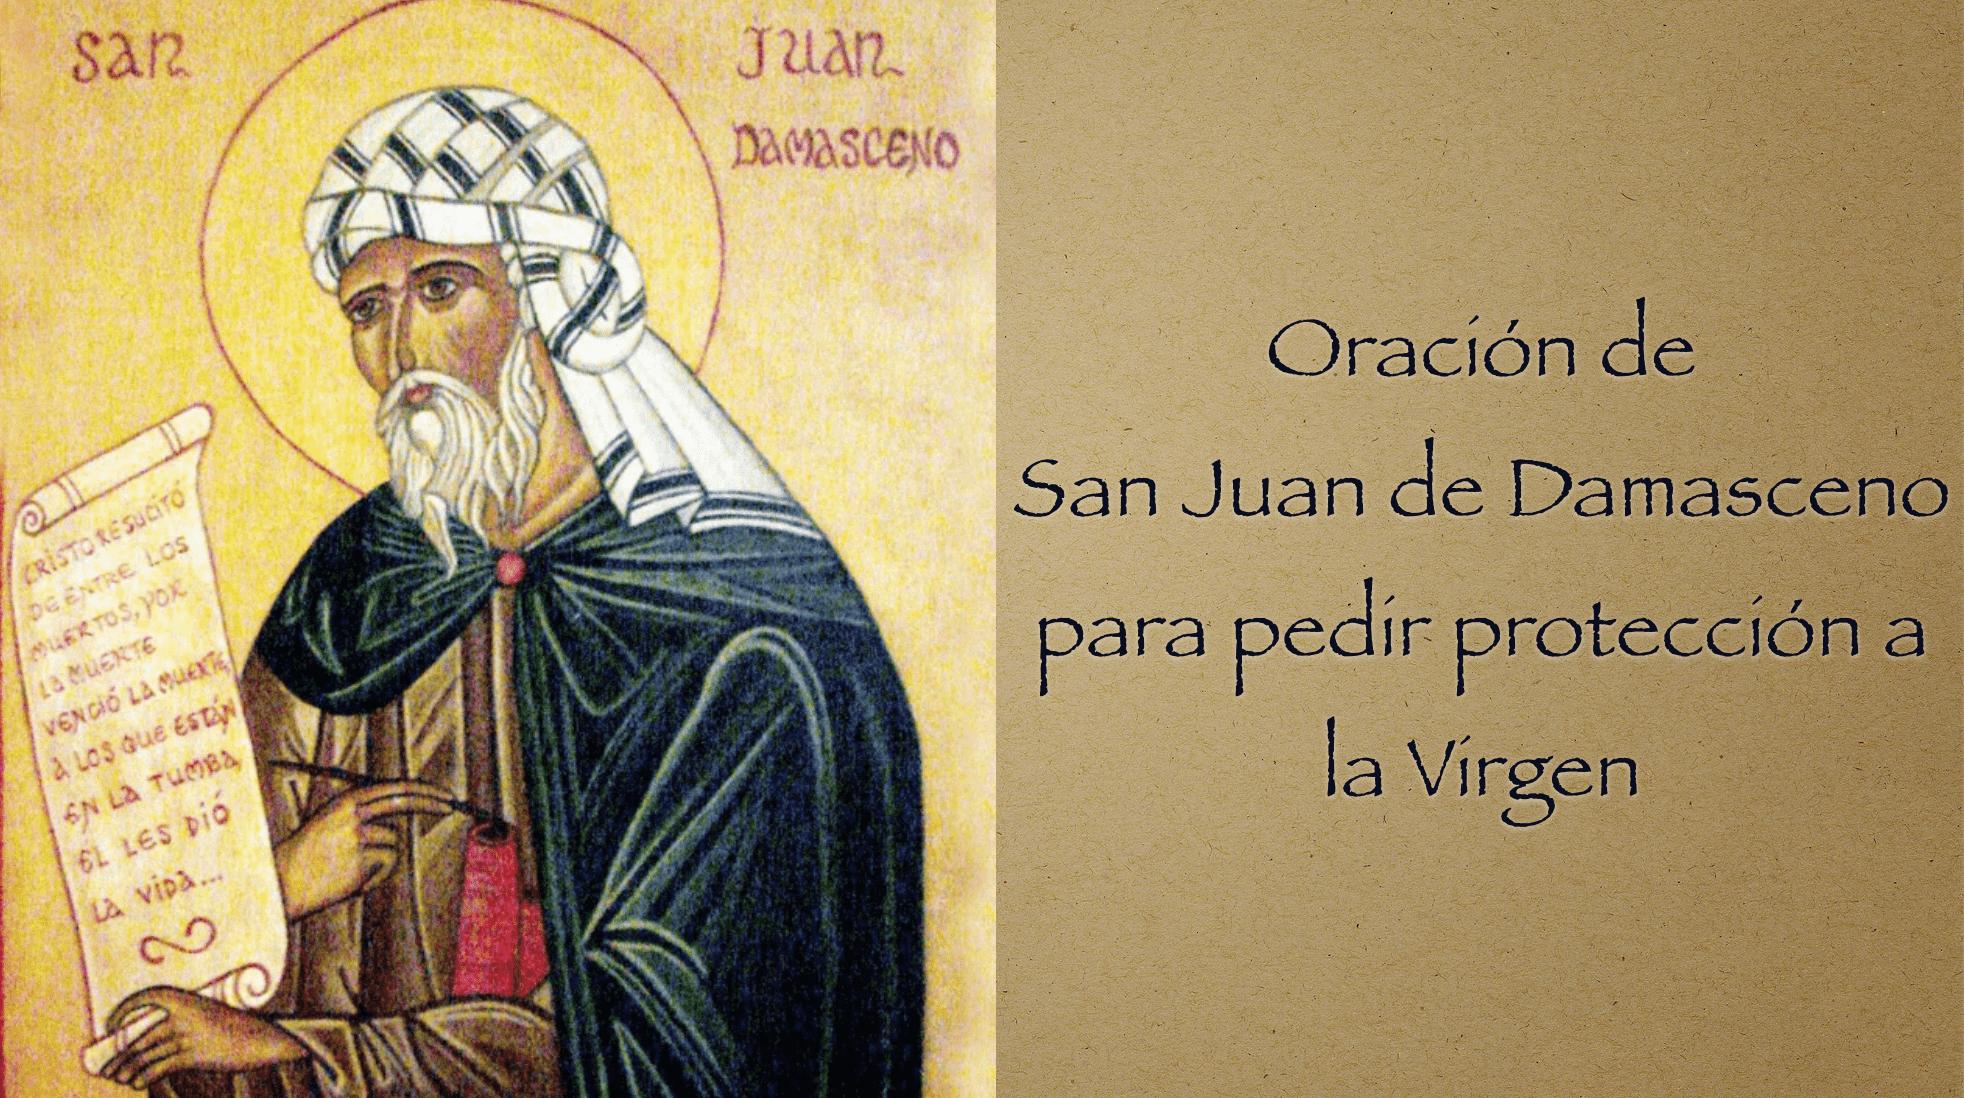 San Juan de Damasceno